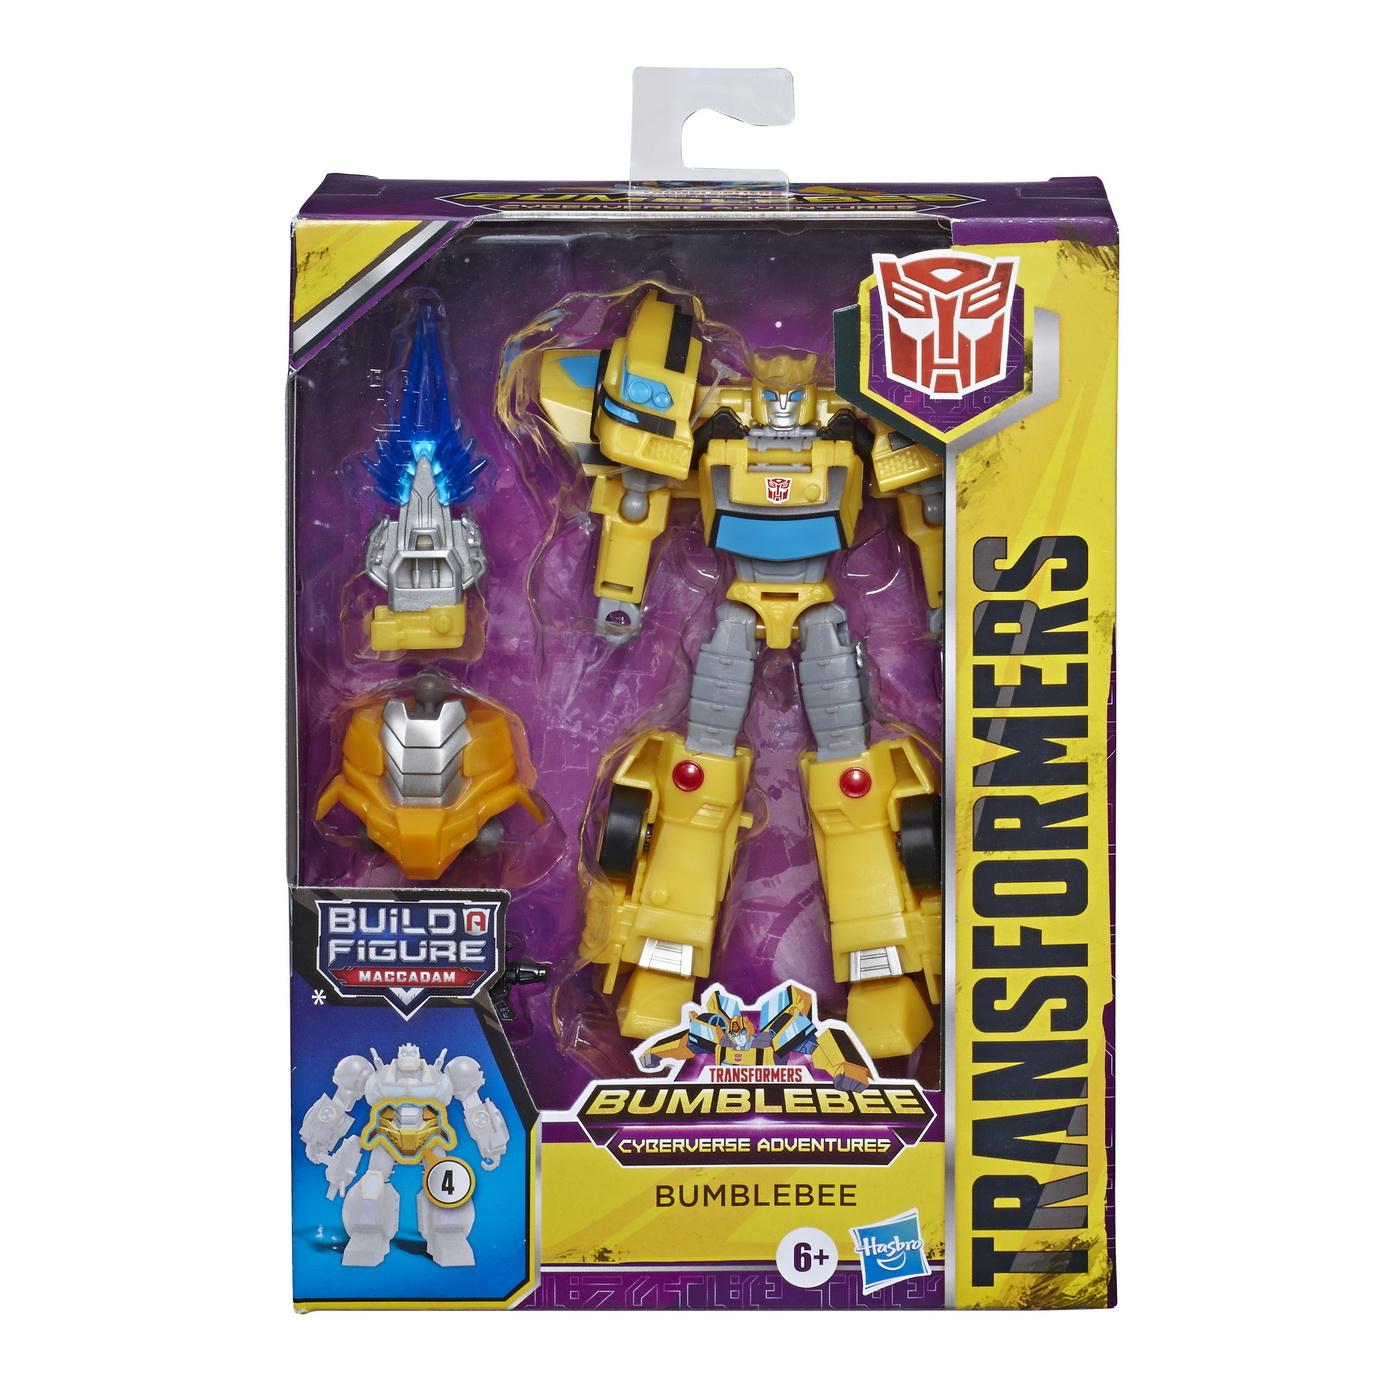 Transformers Robot Vehicul Cyberverse Deluxe Bumblebee